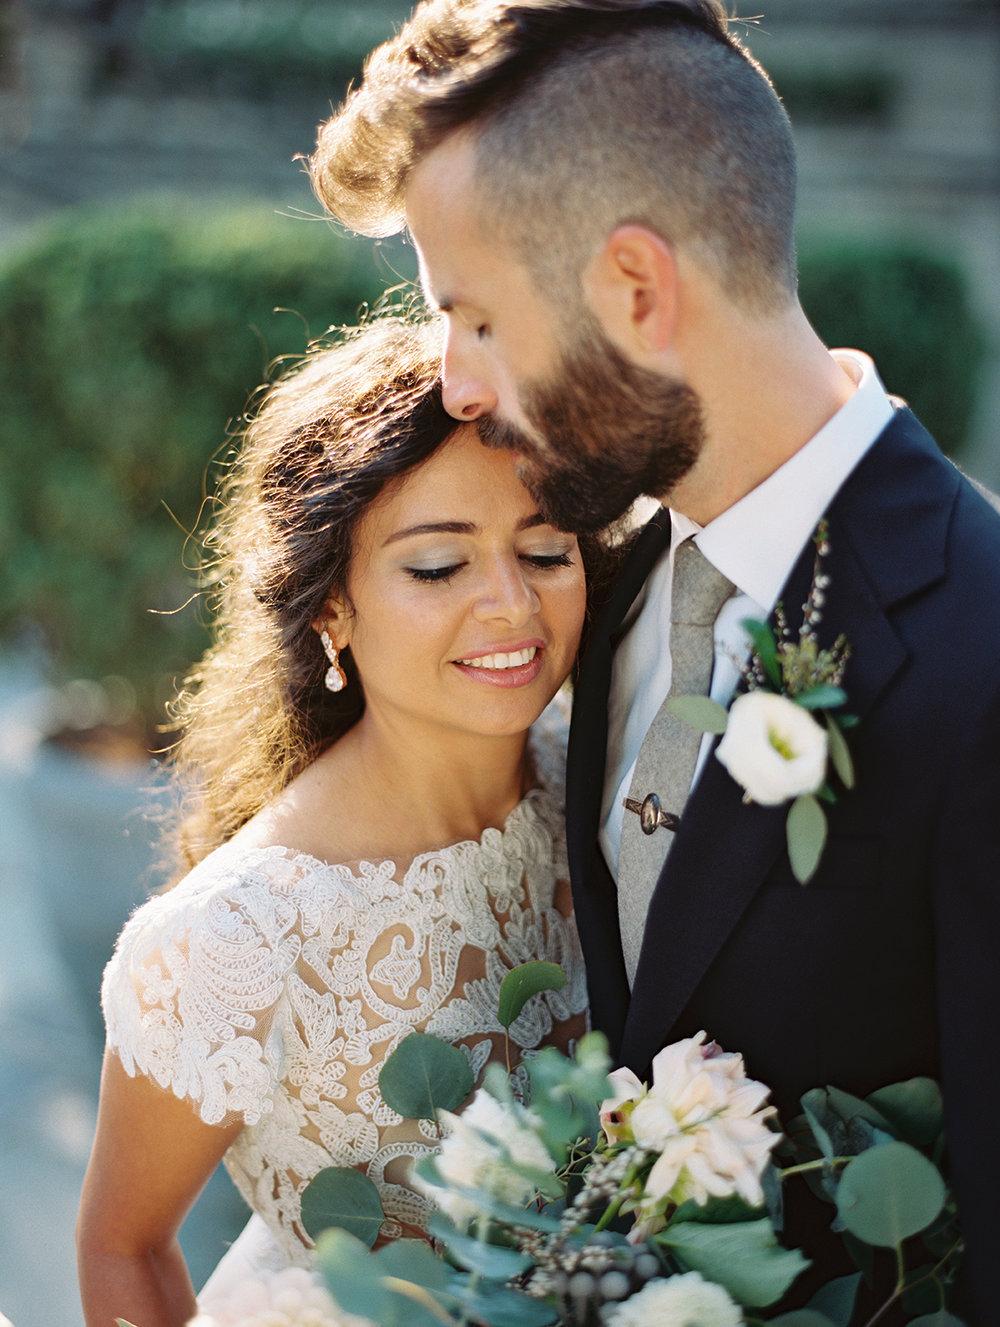 122-brian-sarra-los-angeles-wedding-brumley-wells-photography.jpg